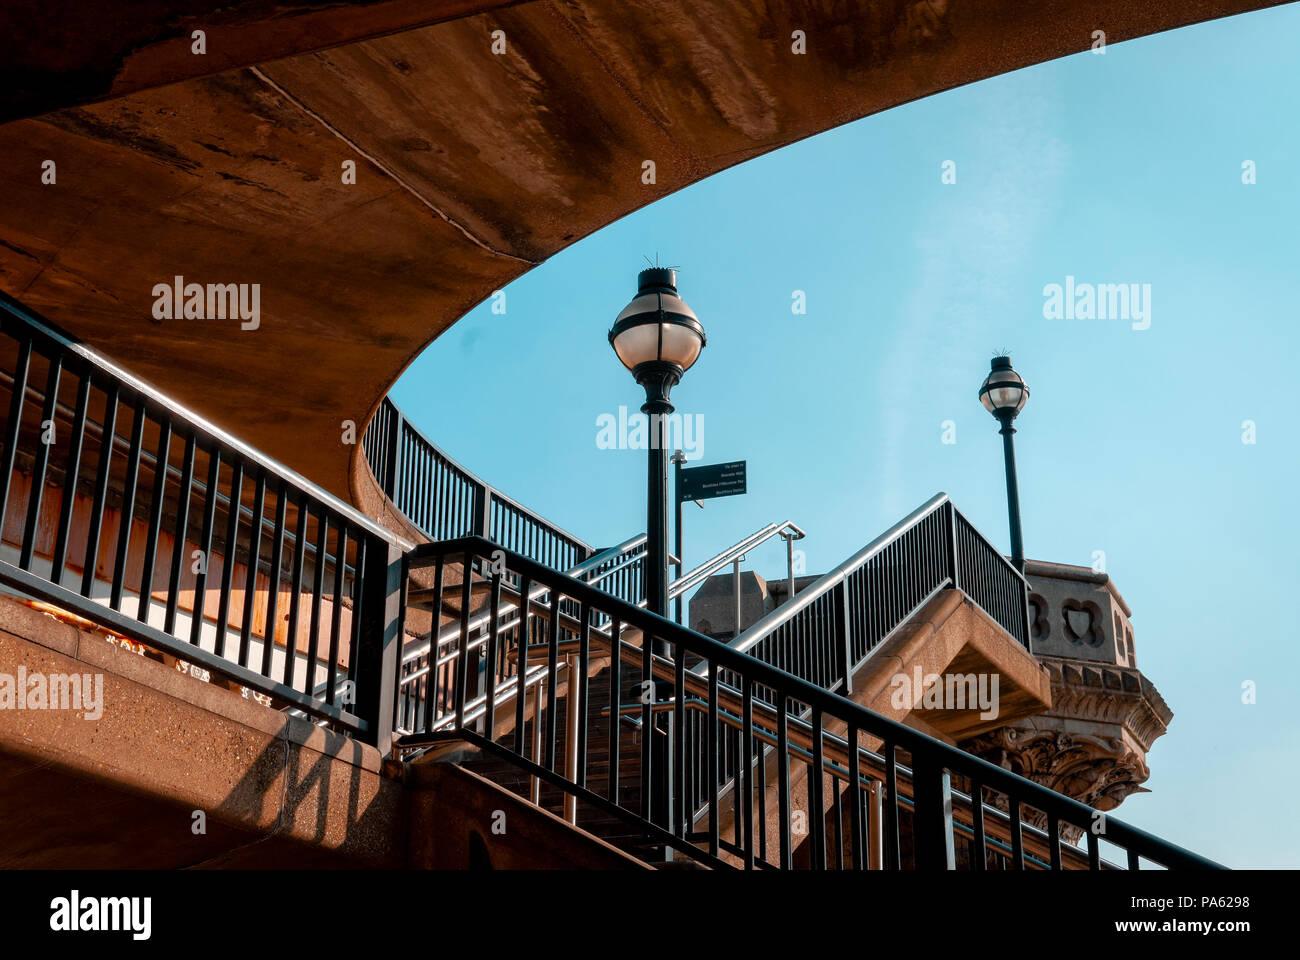 Public Stairway to access Blackfriars Bridge, London, England - Stock Image